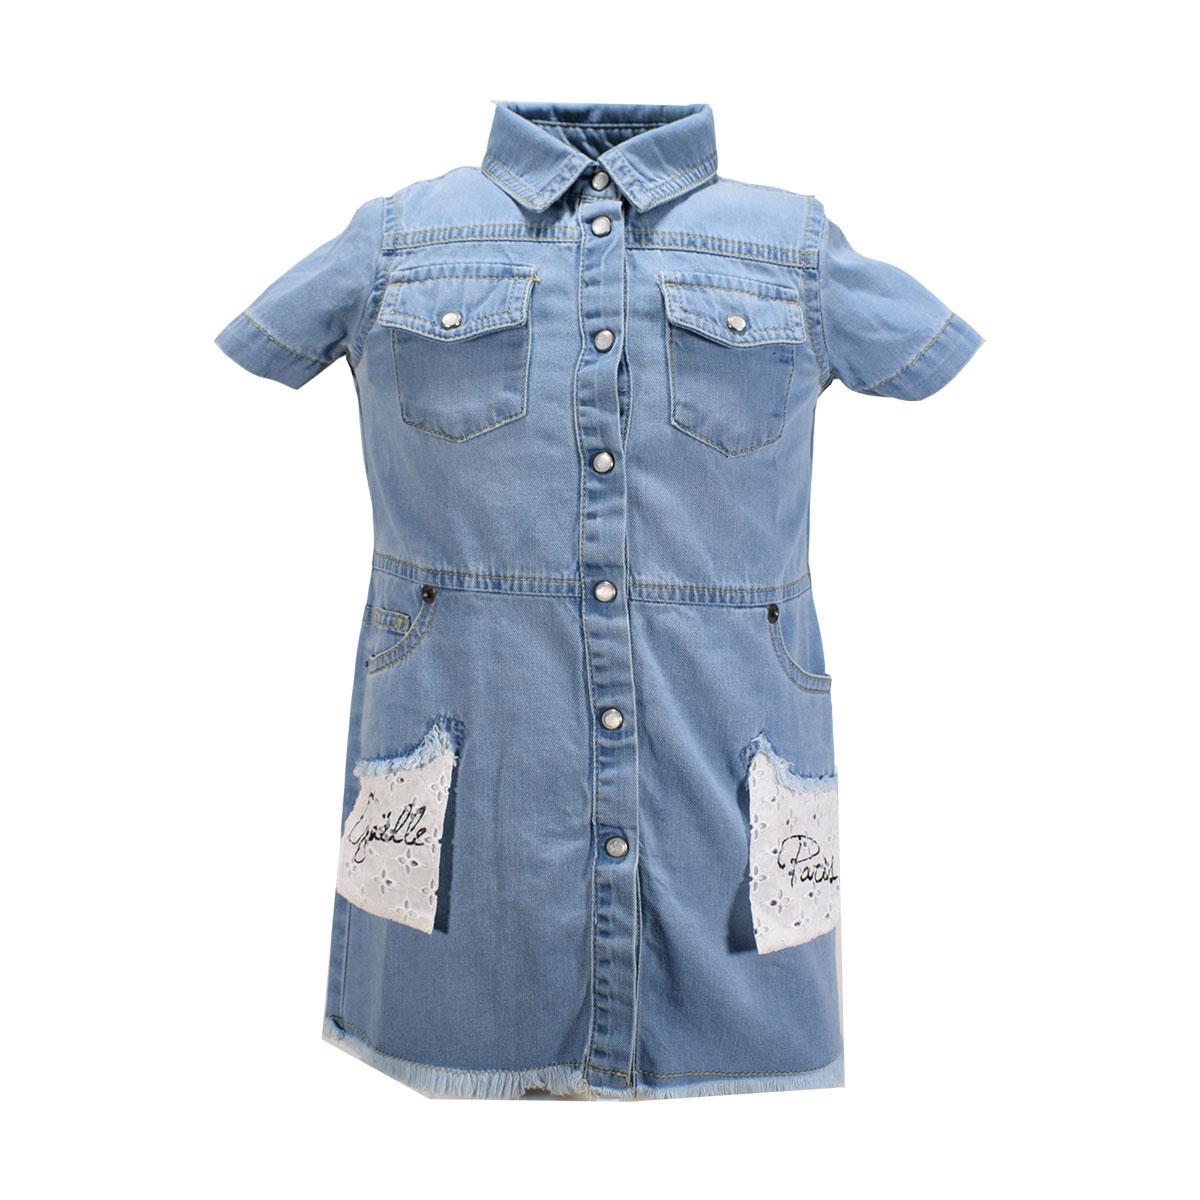 0600d9247b3a Gaelle Girl Abito Jeans Pizzo Sangallo. GAELLE 2746V0079